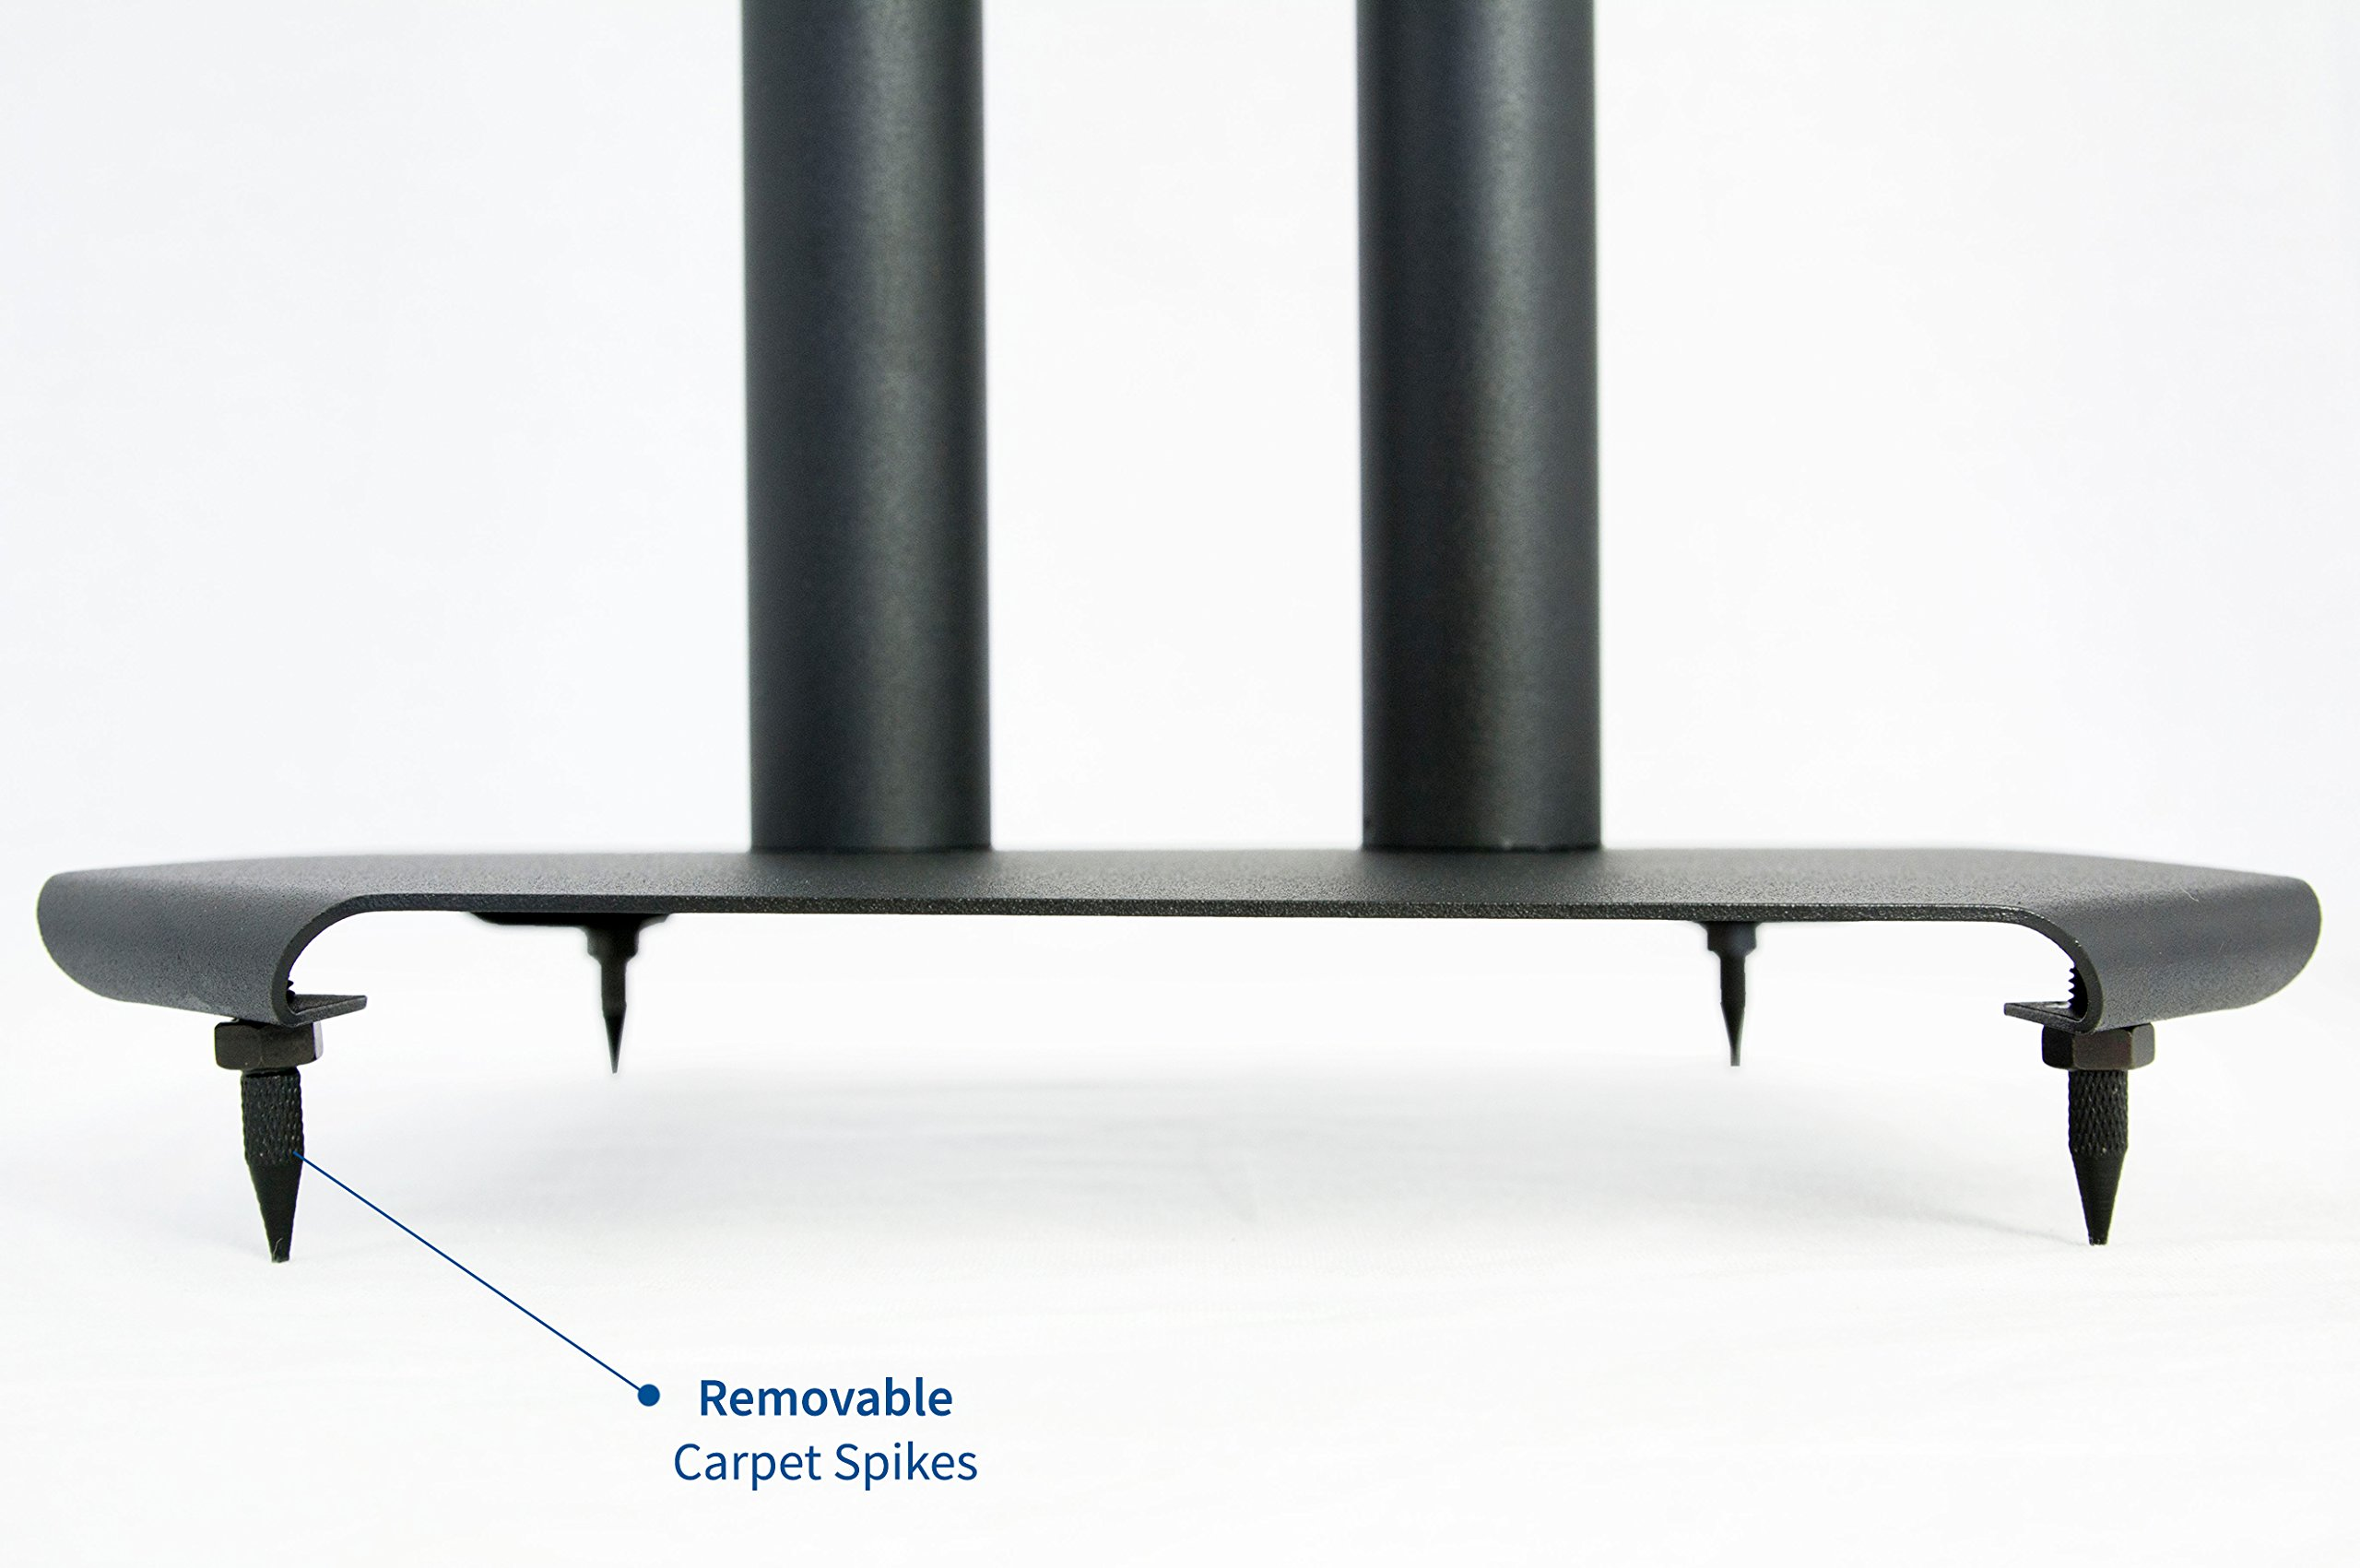 Vivo Premium Universal Floor Speaker Stands For Surround